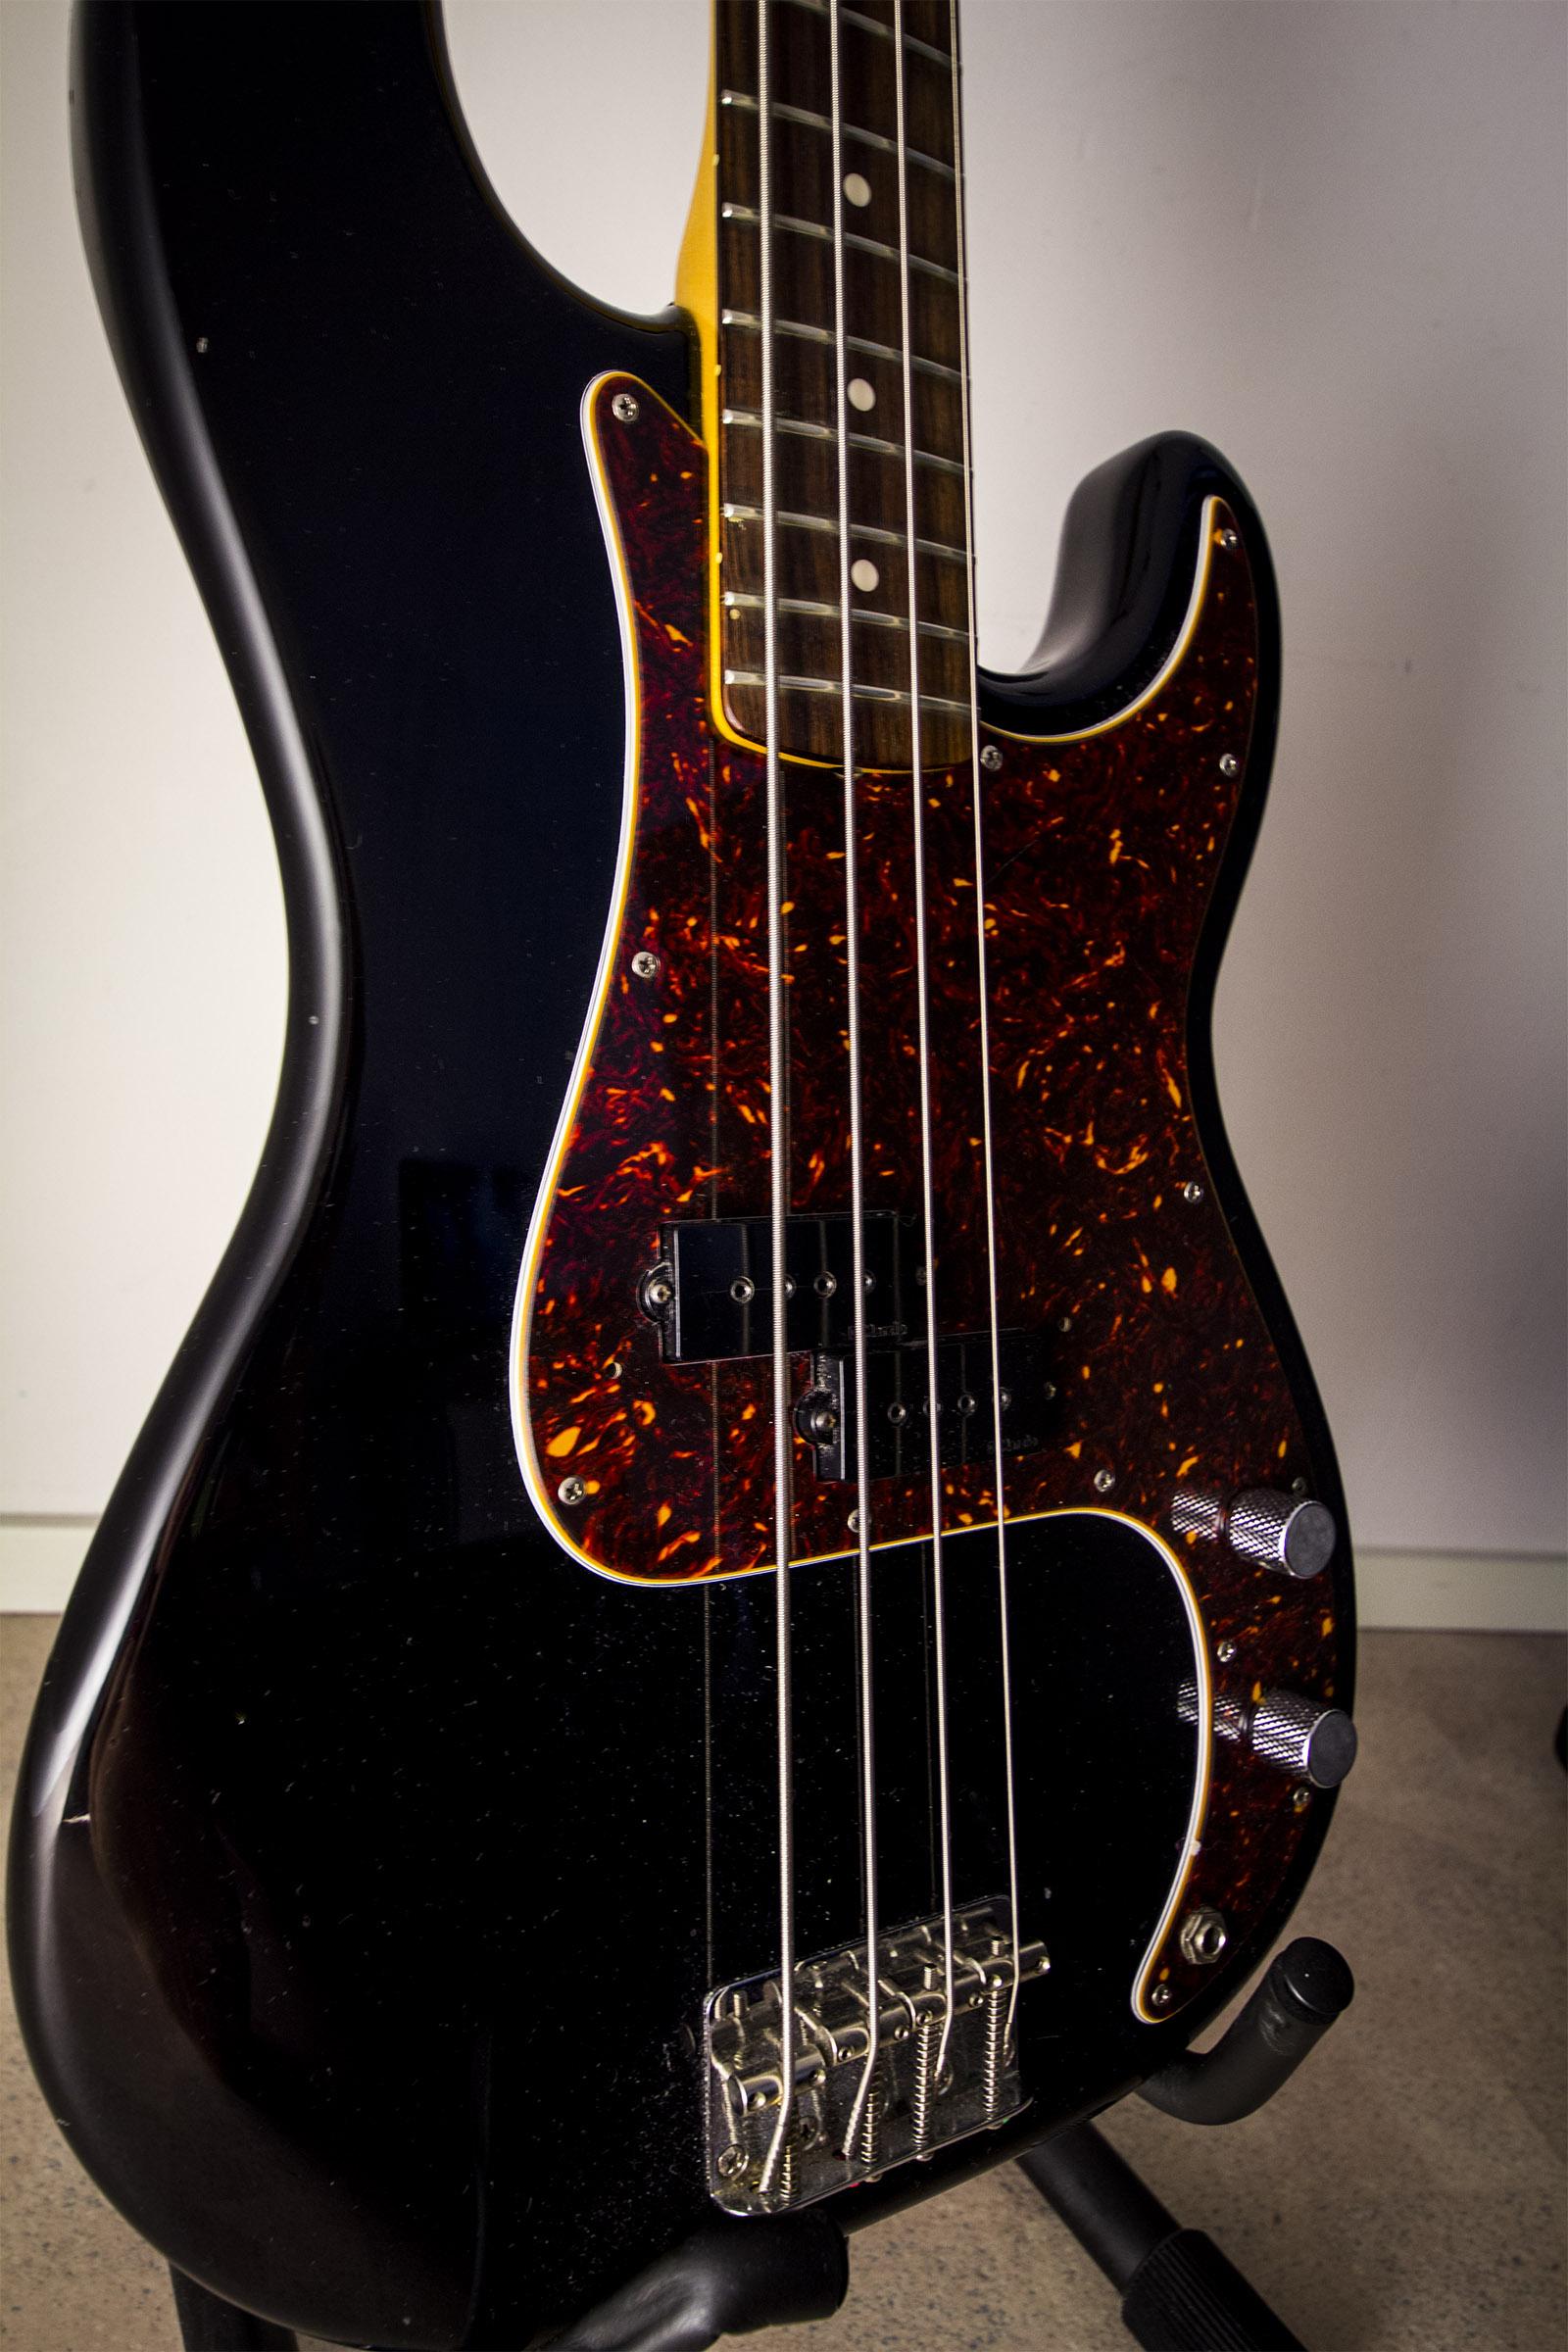 File:Tokai Hard Puncher bass body.jpg - Wikimedia Commons